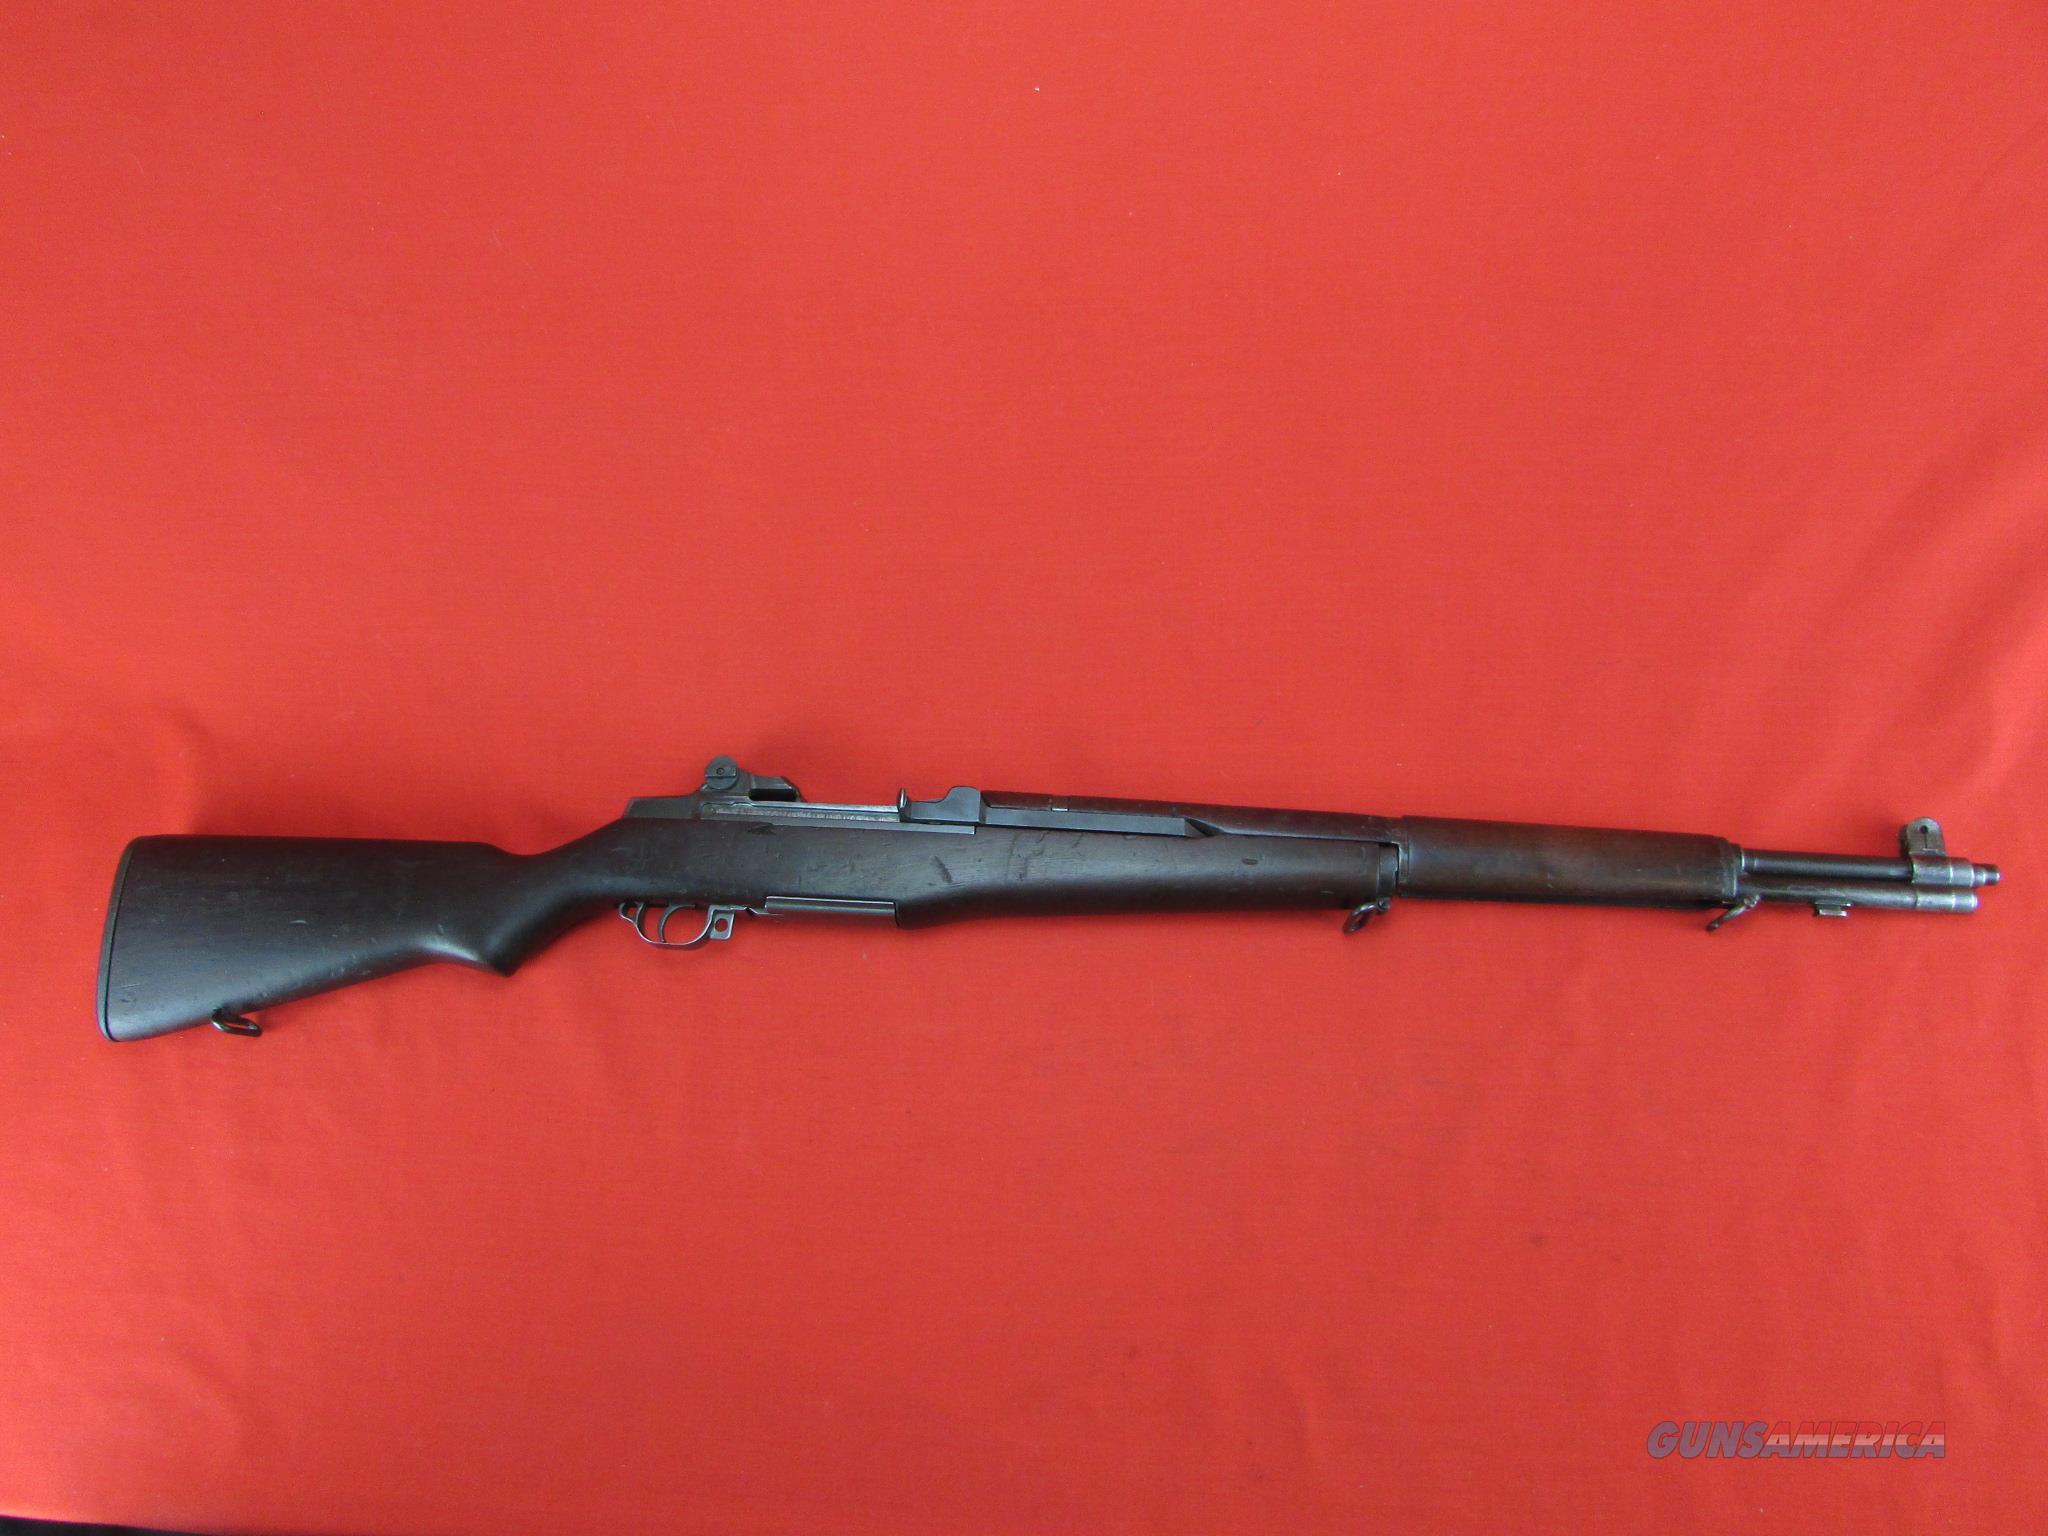 WW2 Springfield M1 Garand w/ 6/45 matching barrel and SA/NFR stock  Guns > Rifles > Military Misc. Rifles US > M1 Garand